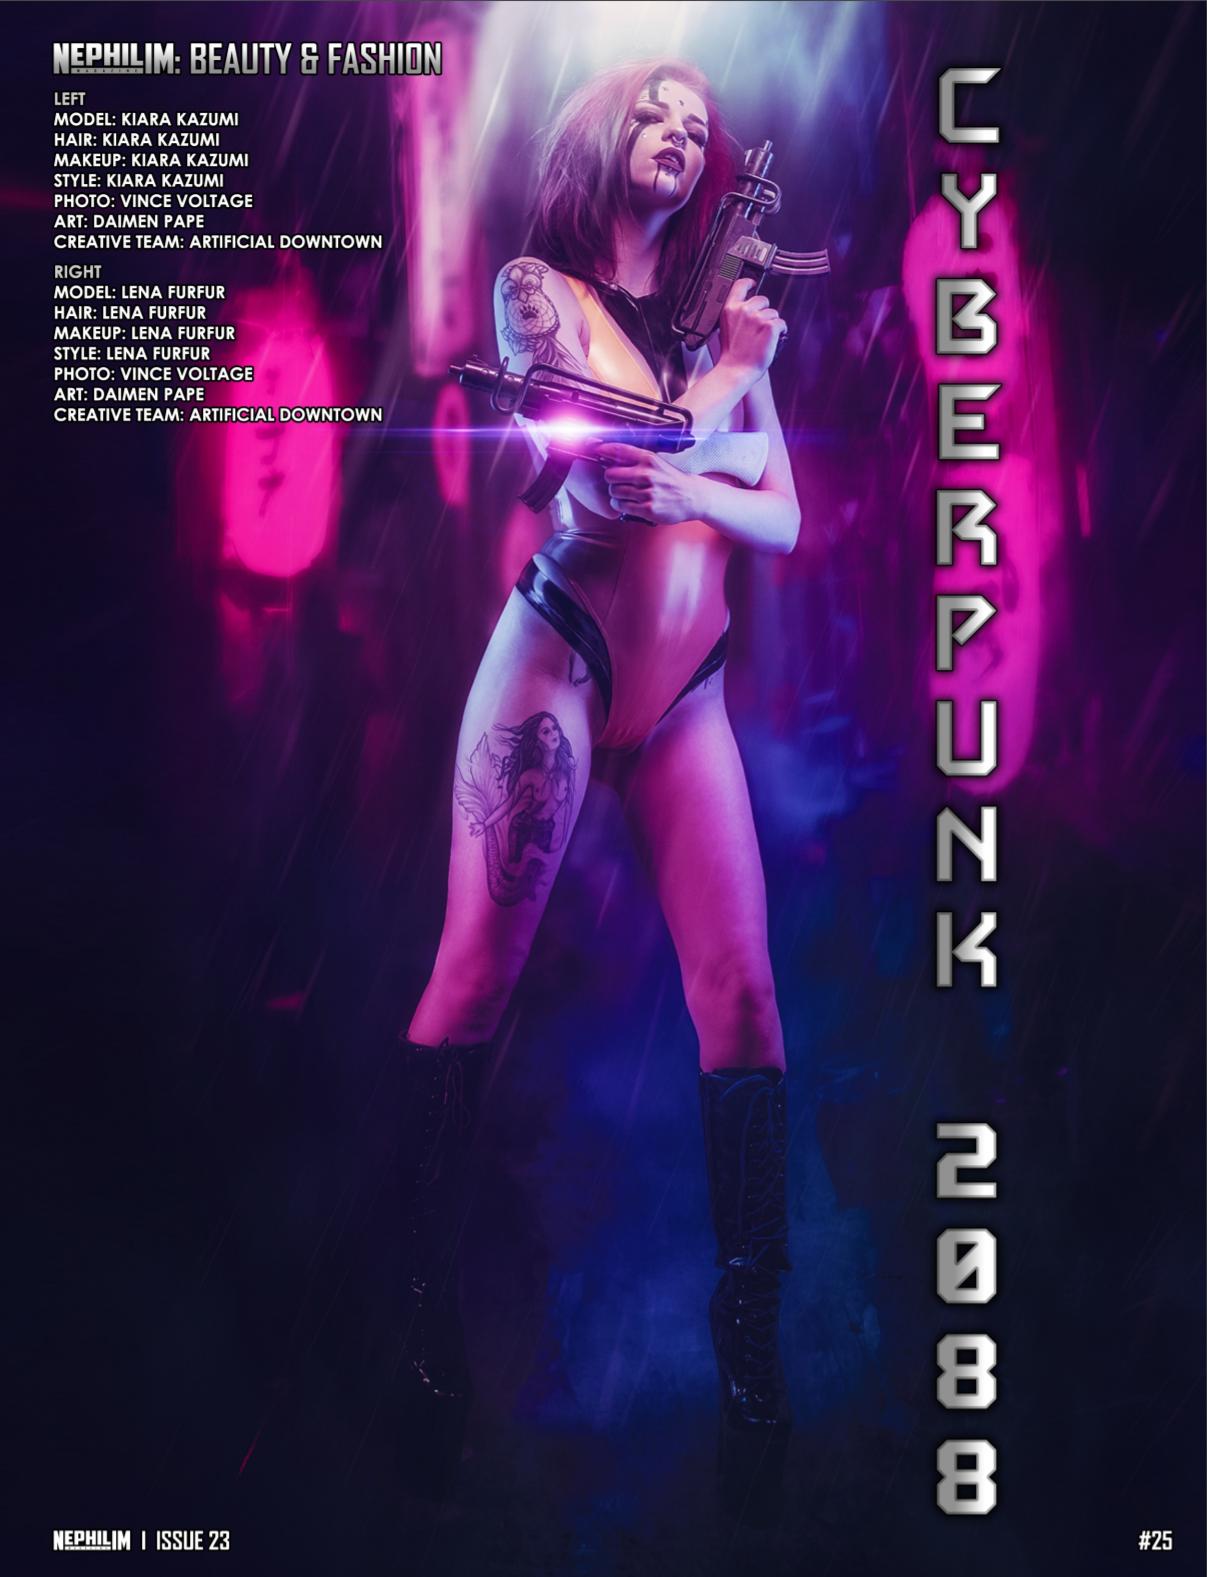 Nephilim Mag March 2020.10